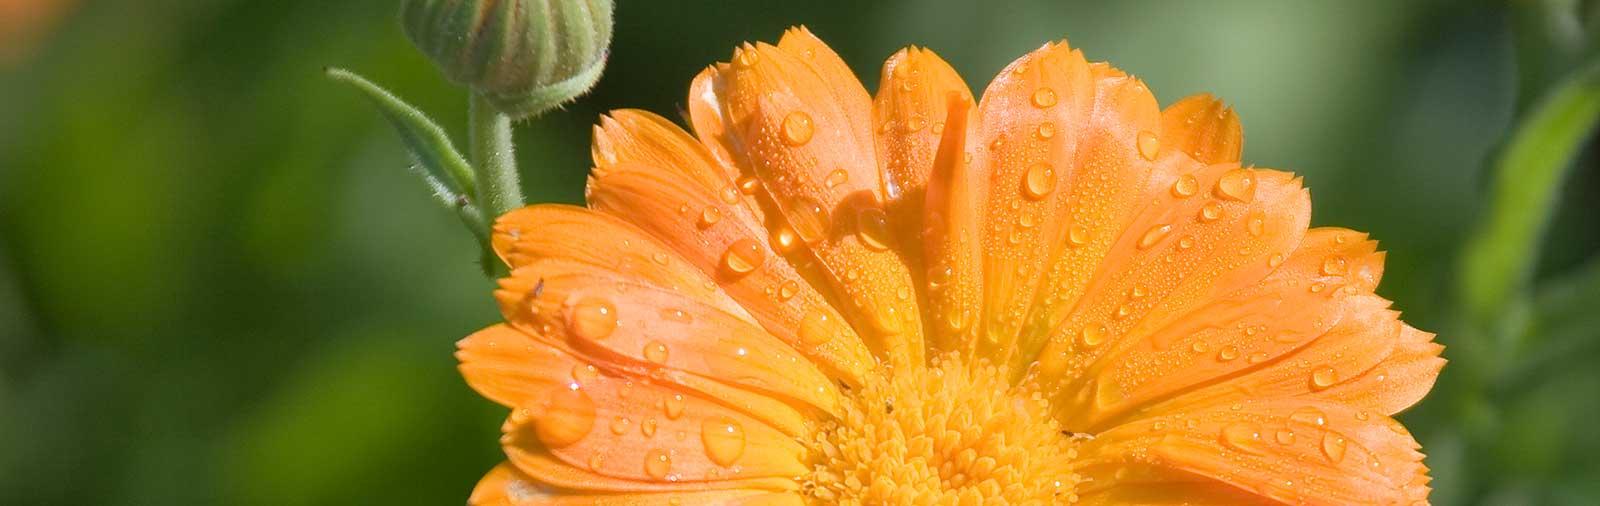 Ringelblume - Calendula officinalis L.